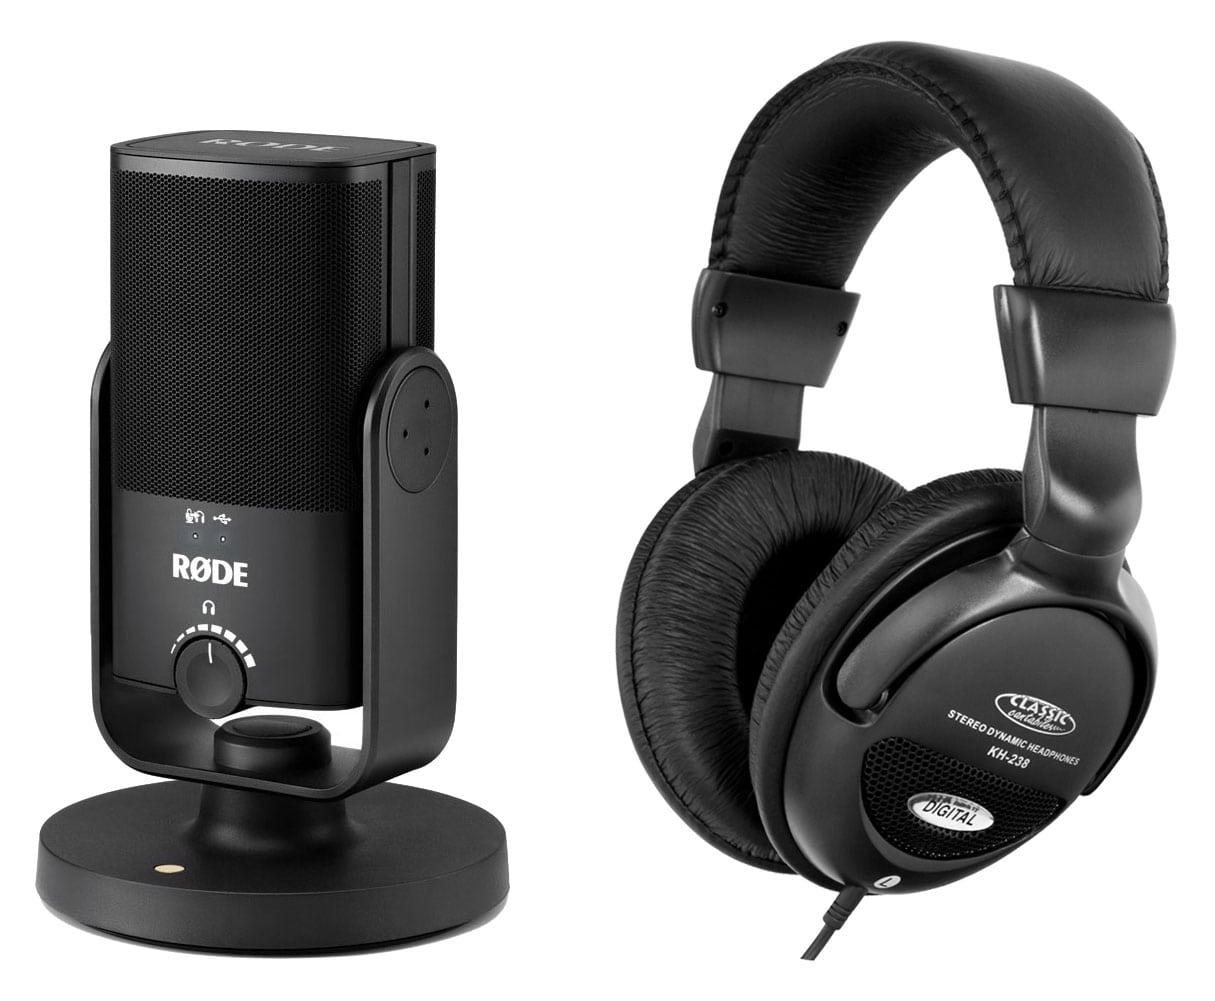 Mikrofone - Rode NT USB Mini Studiomikrofon Set - Onlineshop Musikhaus Kirstein